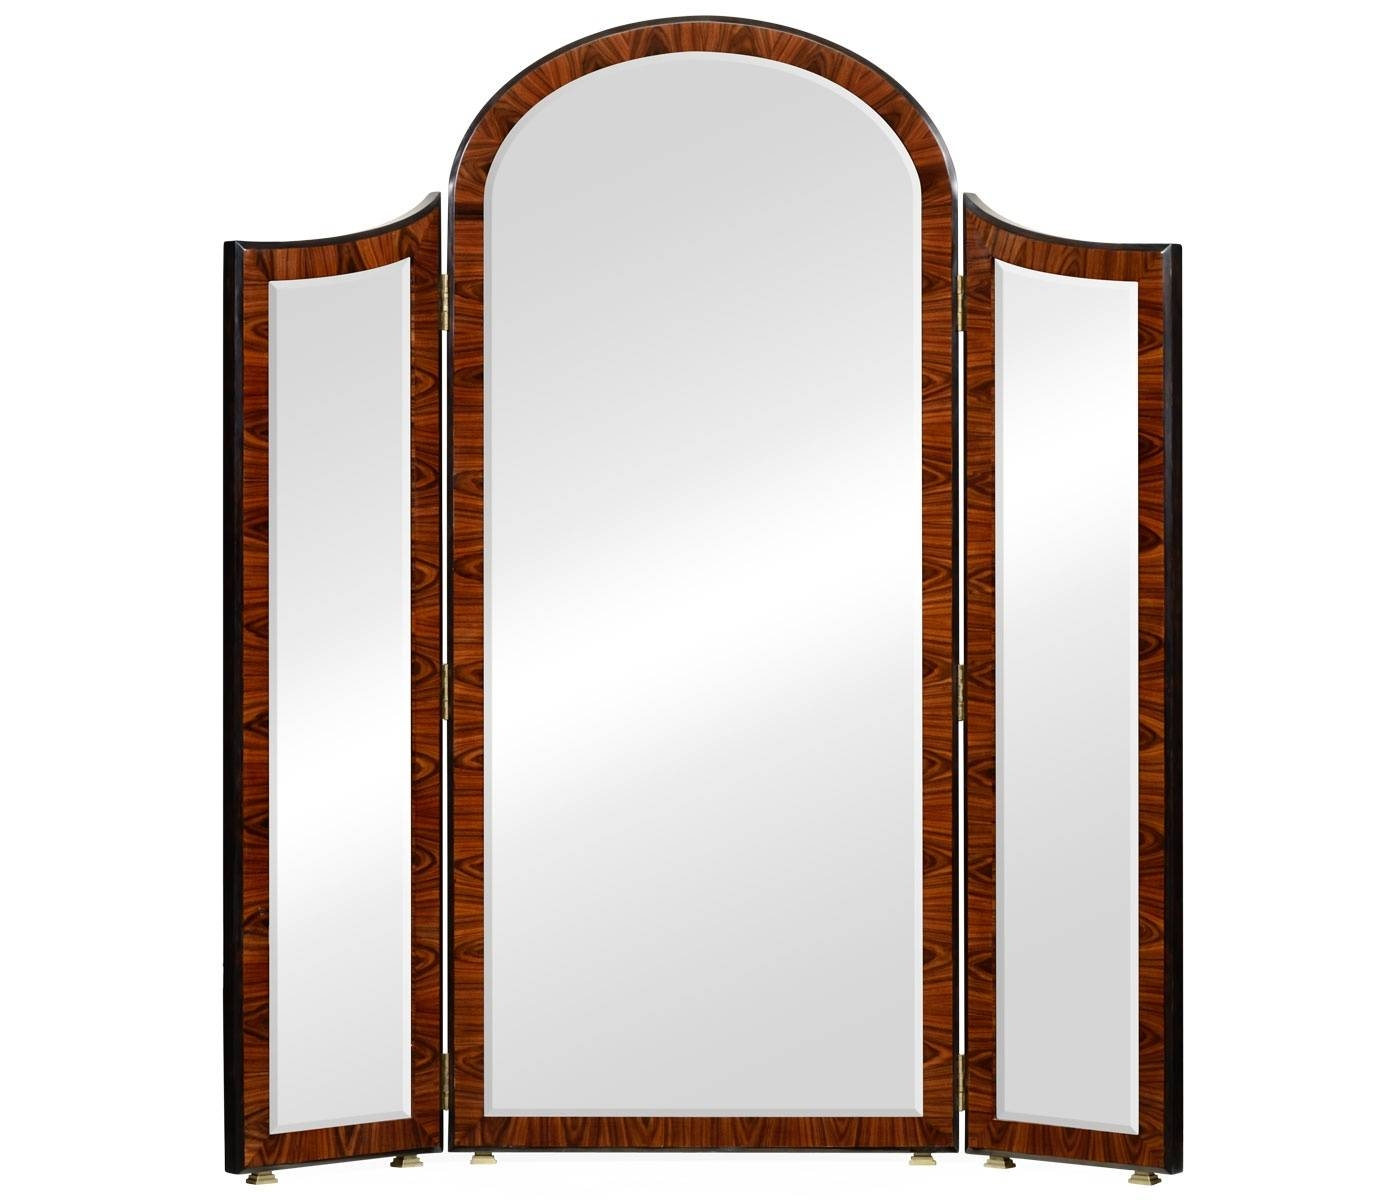 Art Deco Full Length Triple Dressing Mirror | Swanky Interiors with Art Deco Full Length Mirrors (Image 5 of 15)